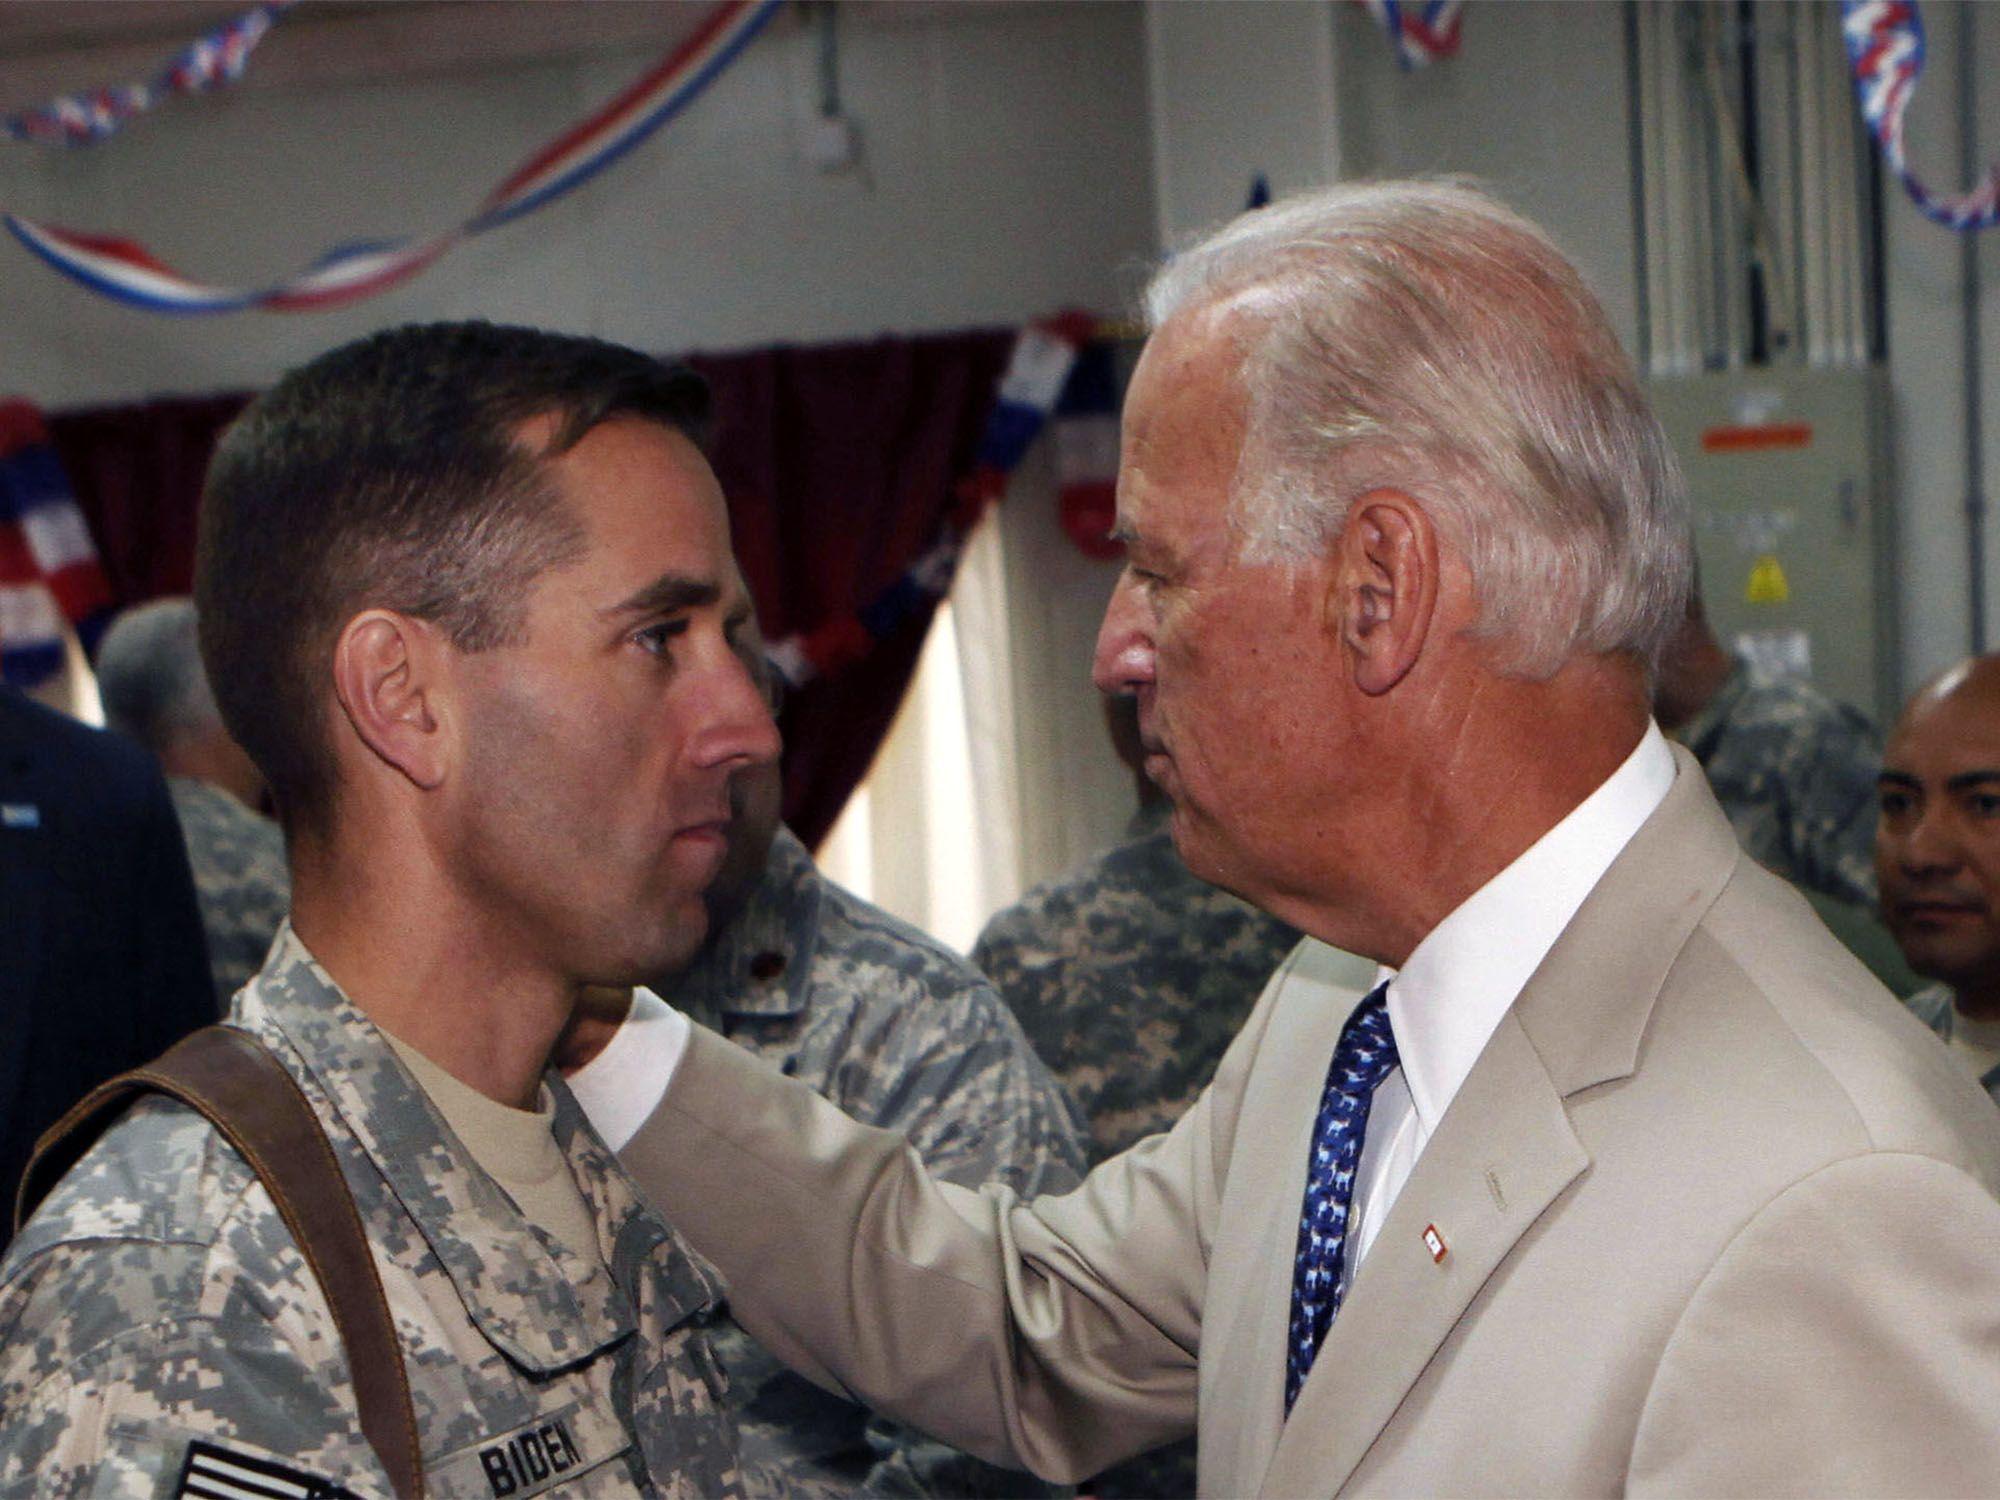 Joe Biden Five Decades Of Ambition